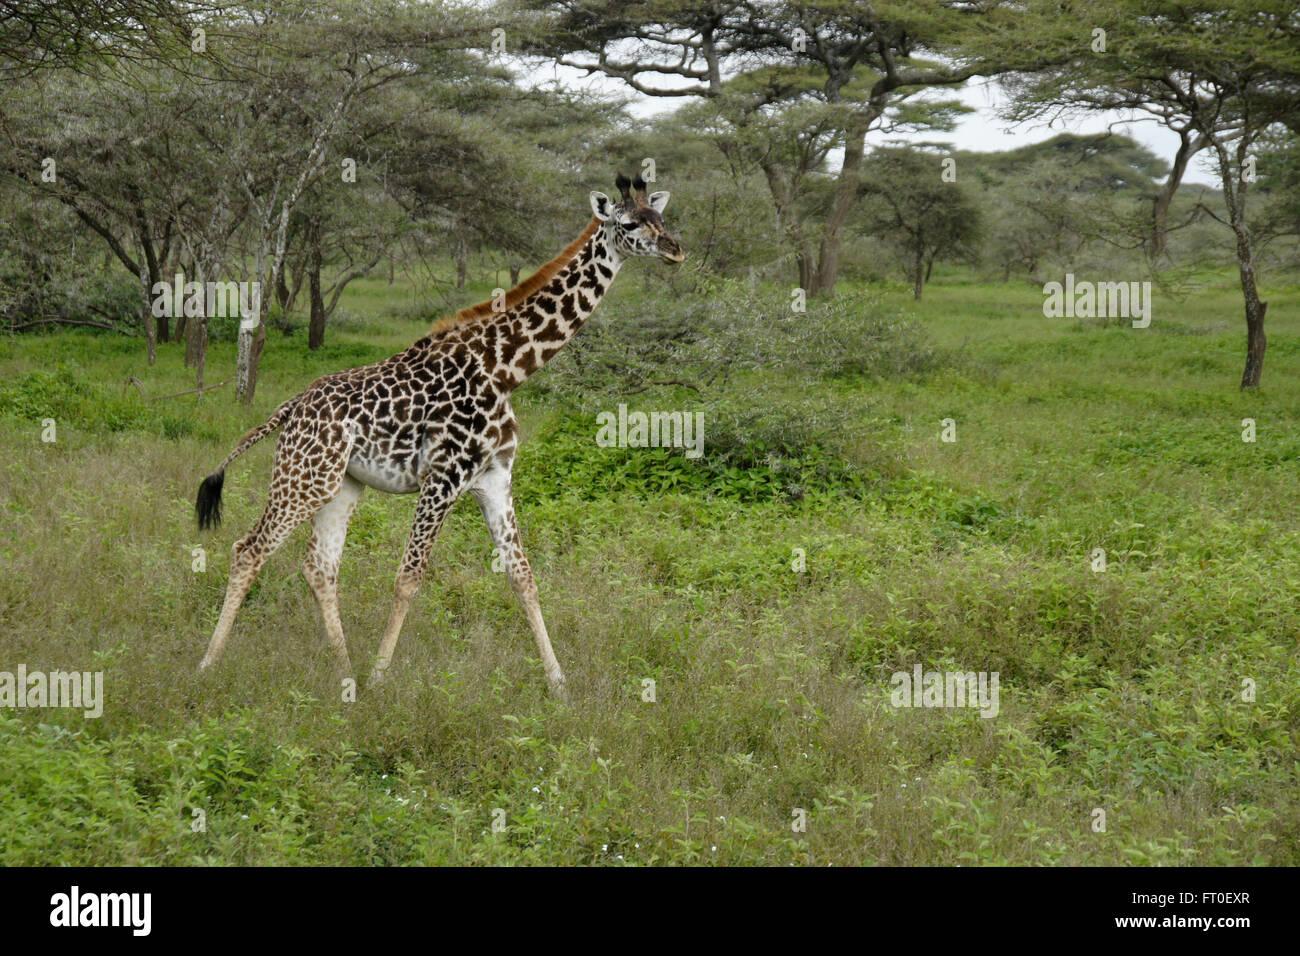 Young Masai giraffe among acacia trees, Ngorongoro Conservation Area (Ndutu), Tanzania - Stock Image